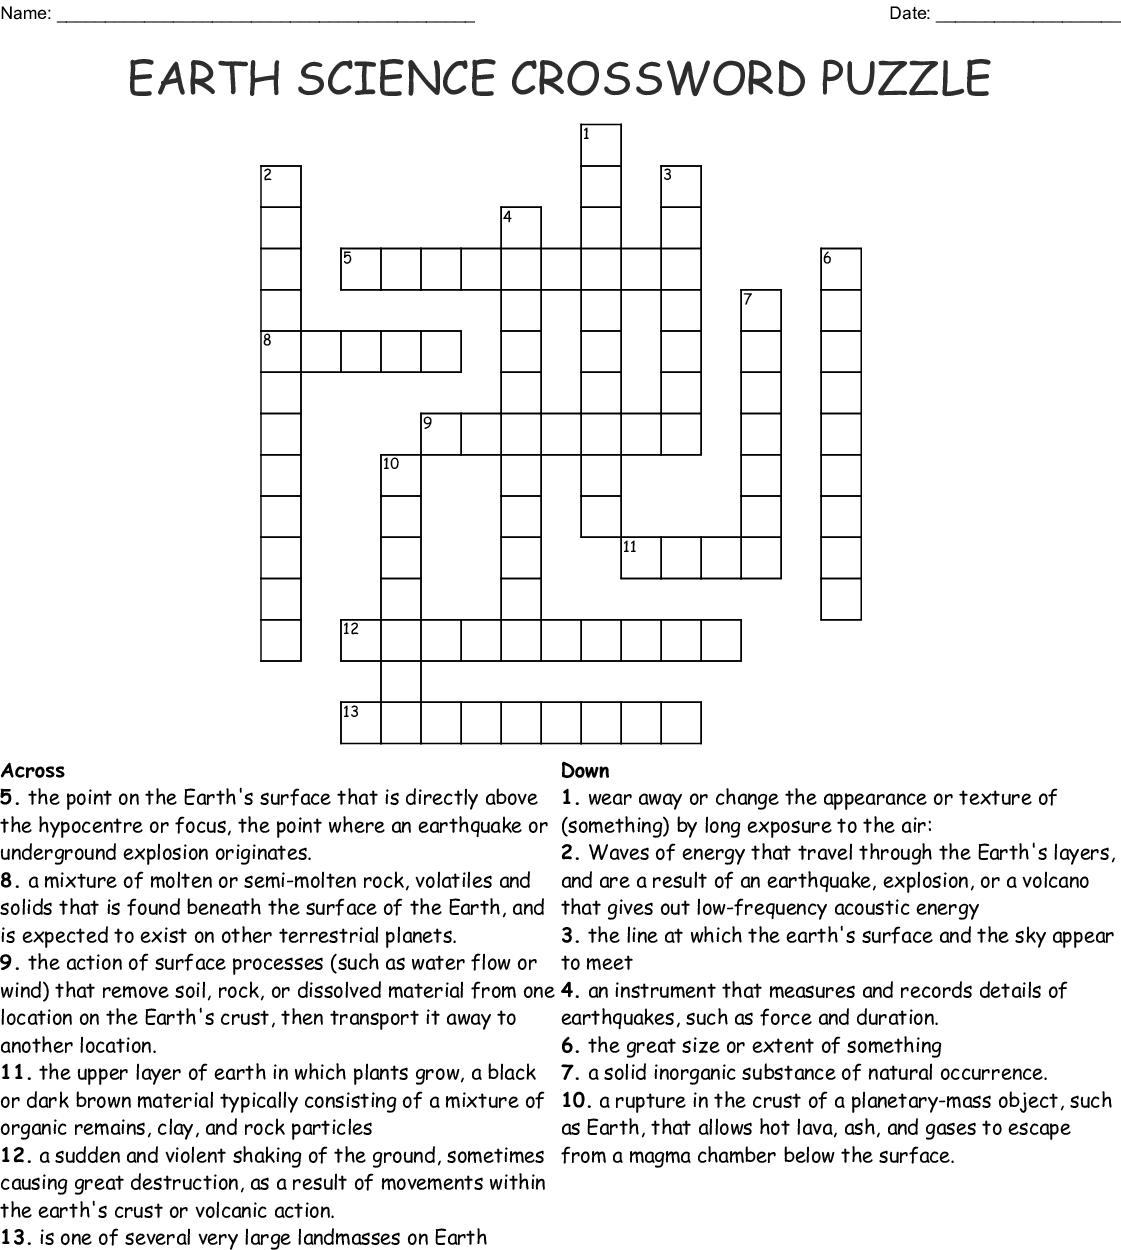 Earth Science Crossword Puzzle Crossword - Wordmint - Printable Science Crossword Puzzles